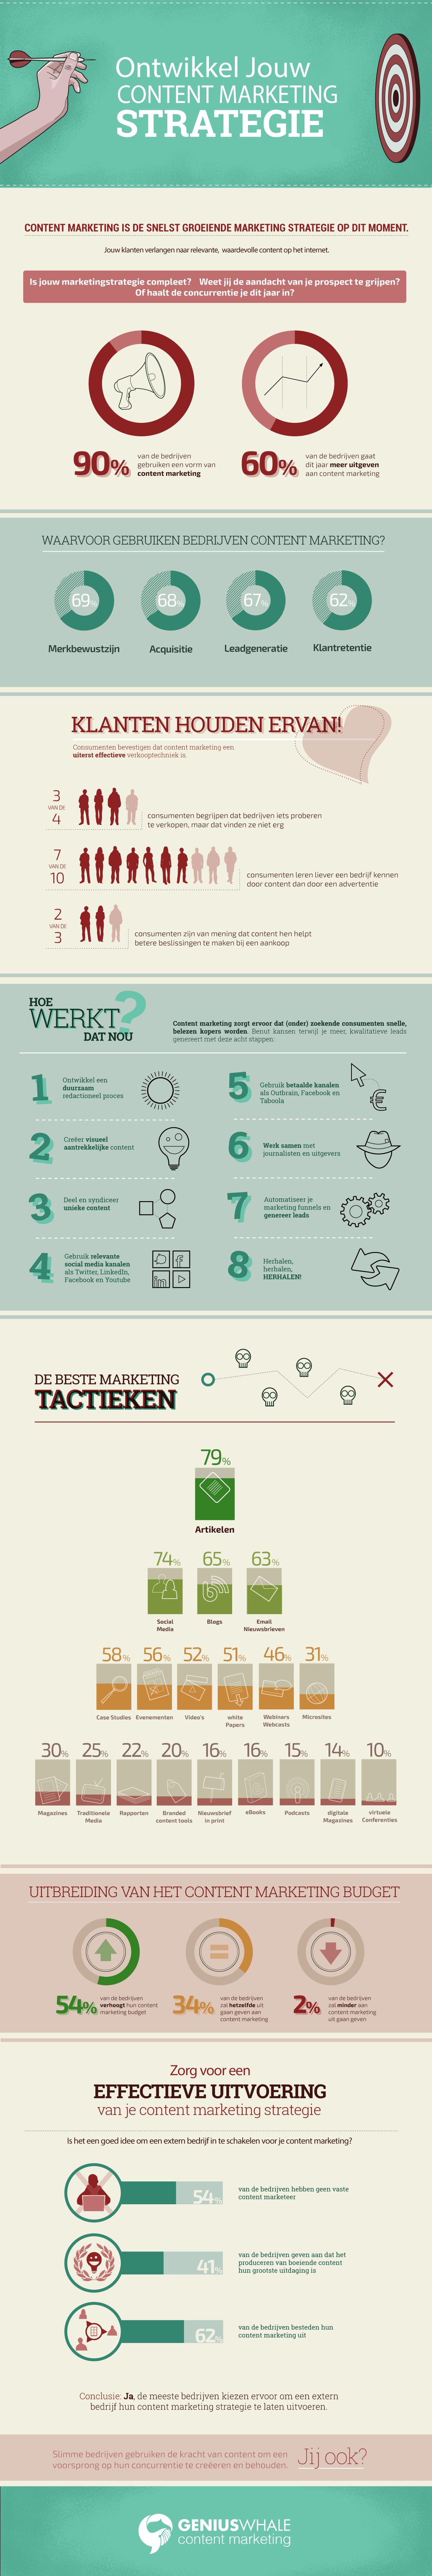 contentmarketing.strategie